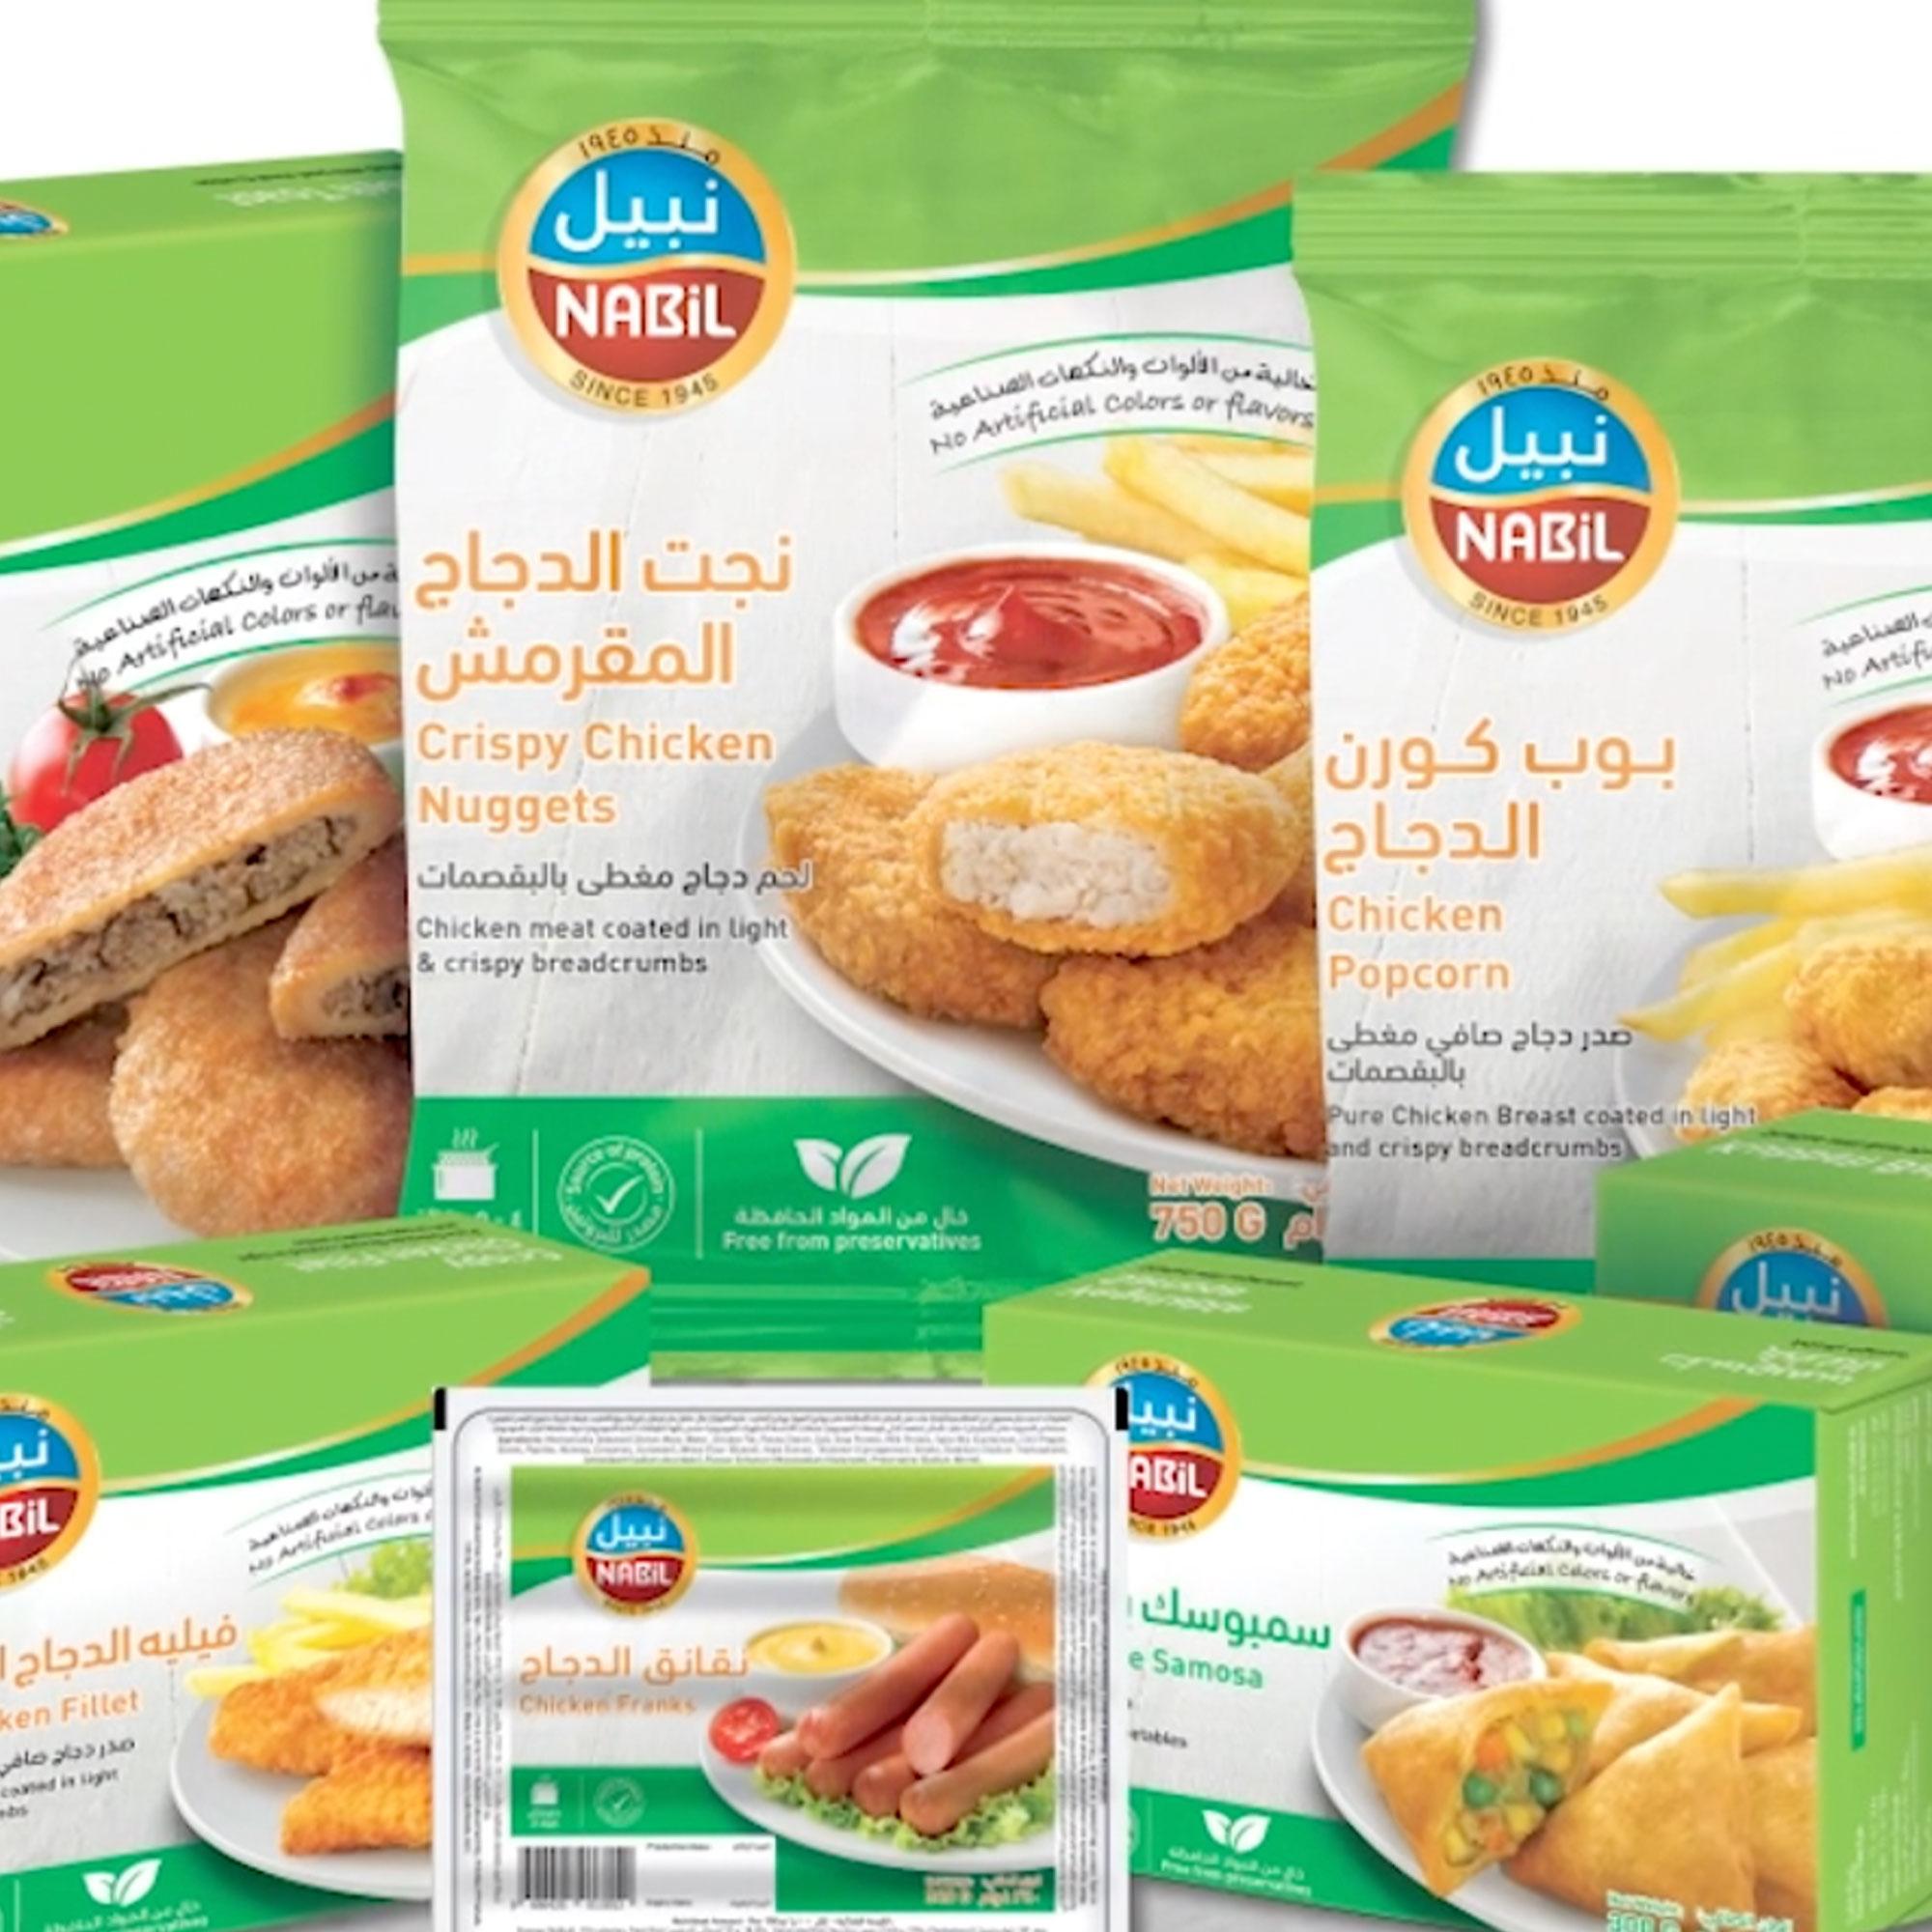 Nabil Foods